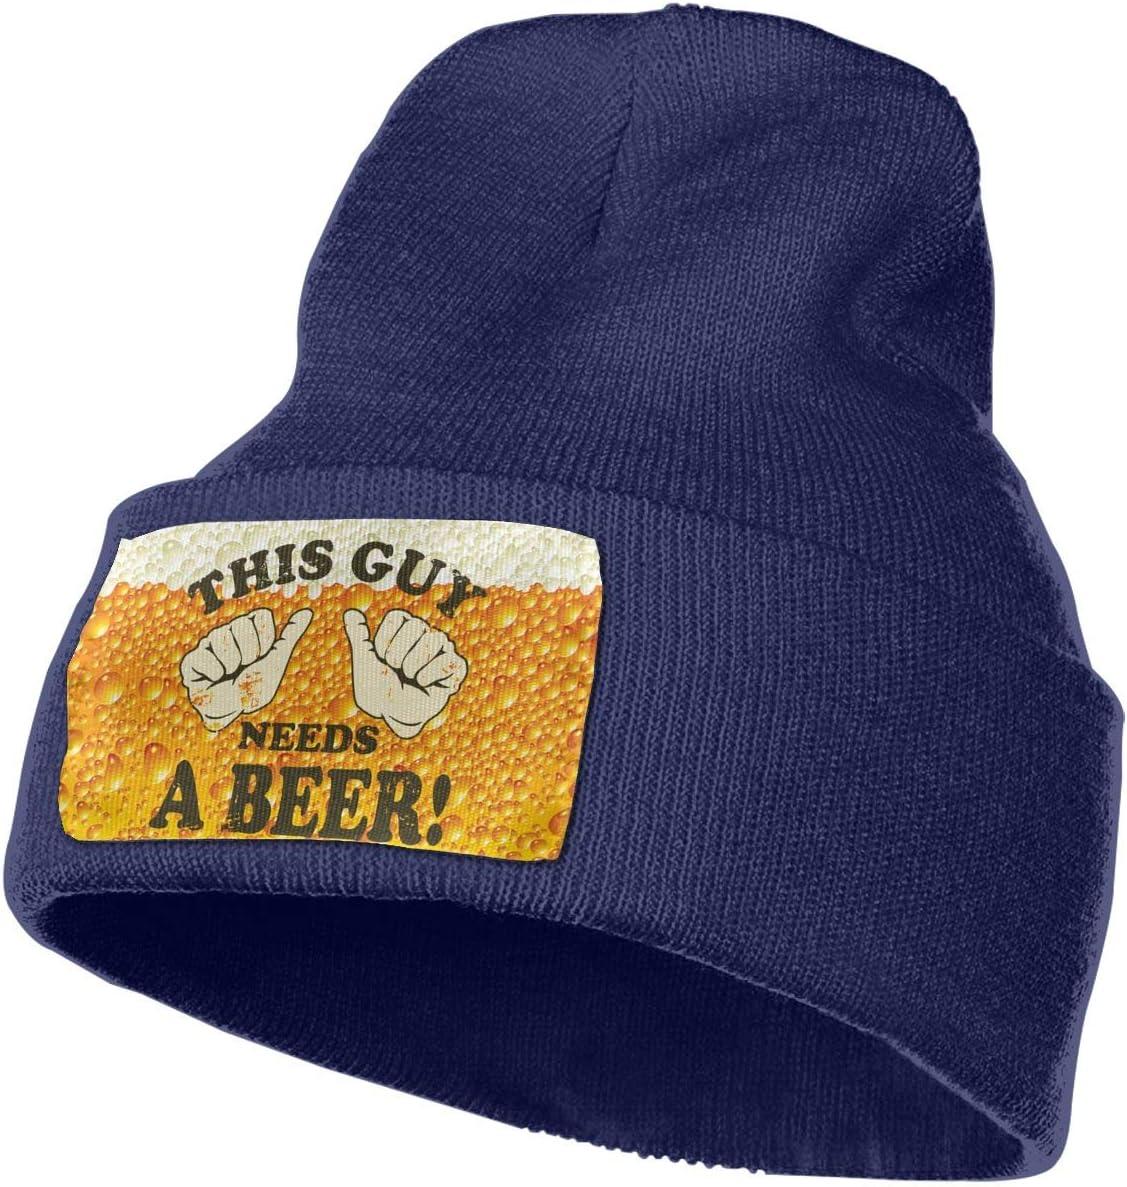 This Guy Need Beer Men/&Women Warm Winter Knit Plain Beanie Hat Skull Cap Acrylic Knit Cuff Hat